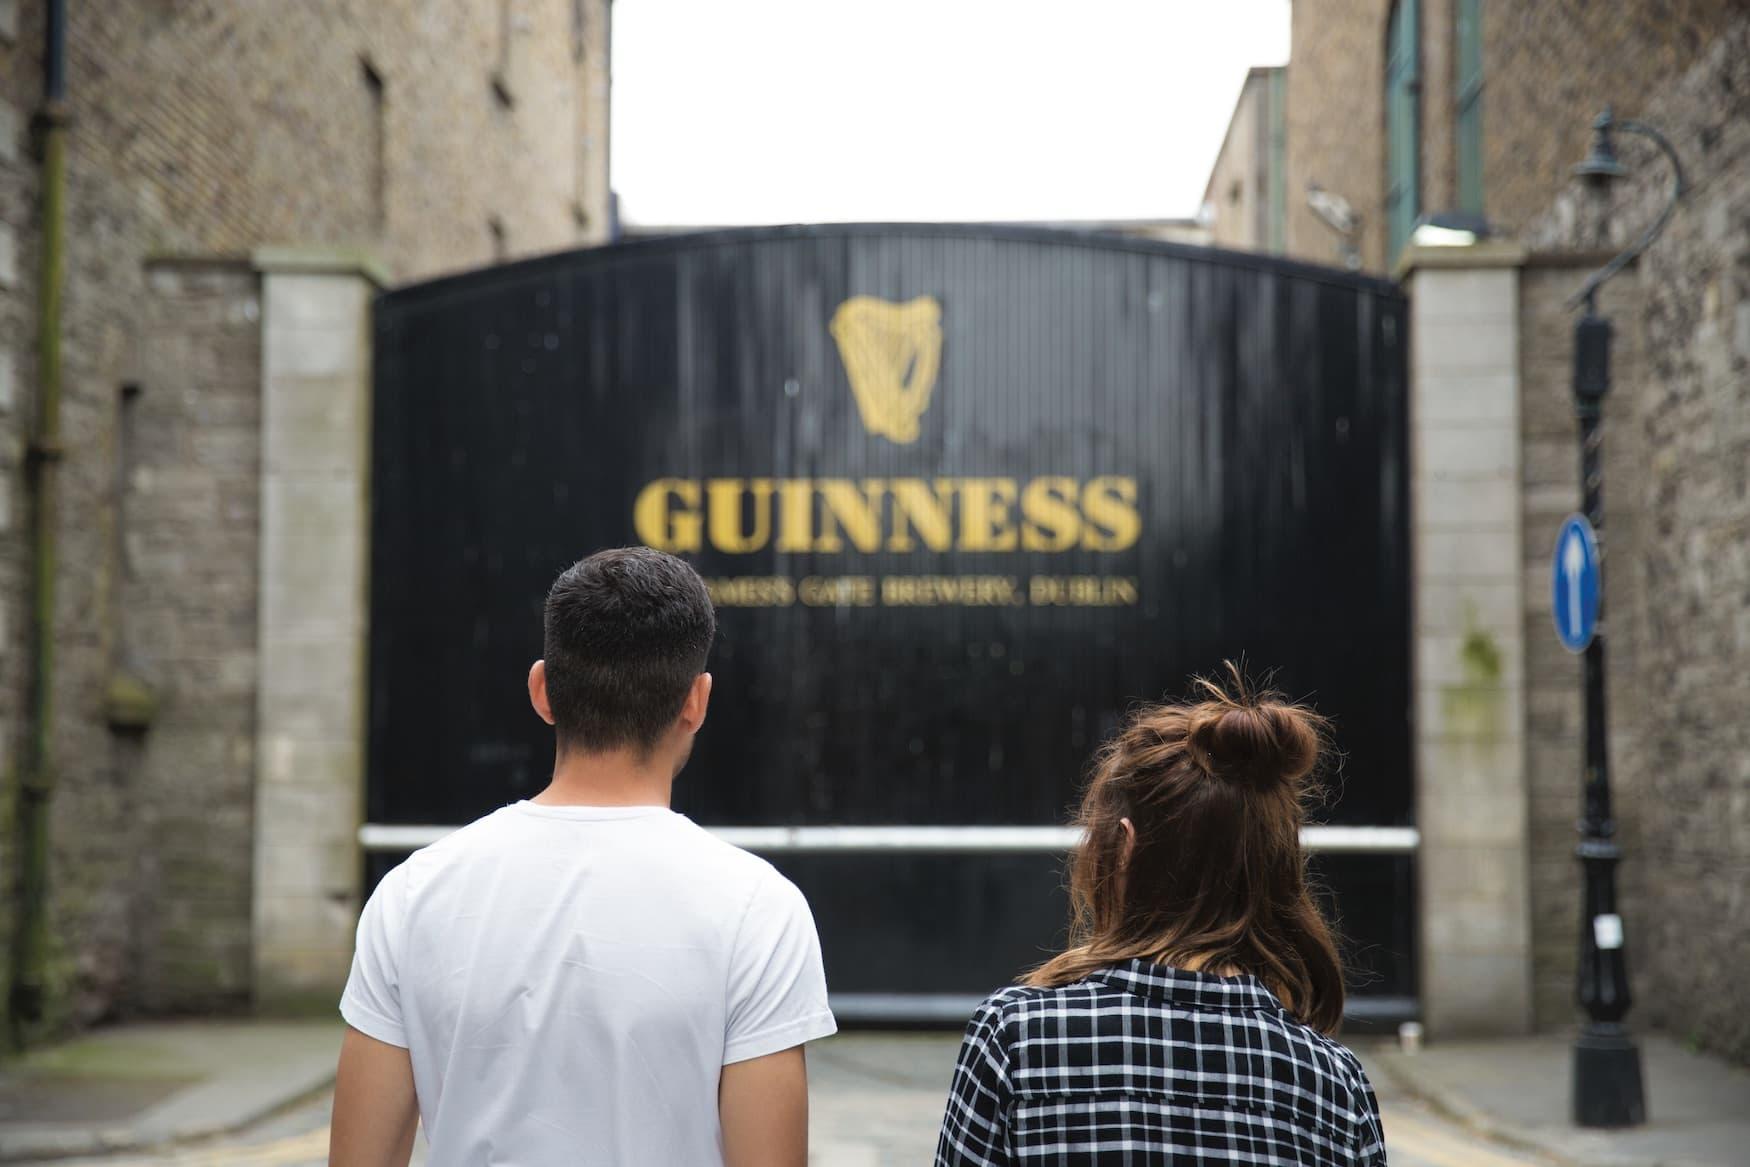 Junges Pärchen vor den Toren der Guinness Brauerei in Dublin